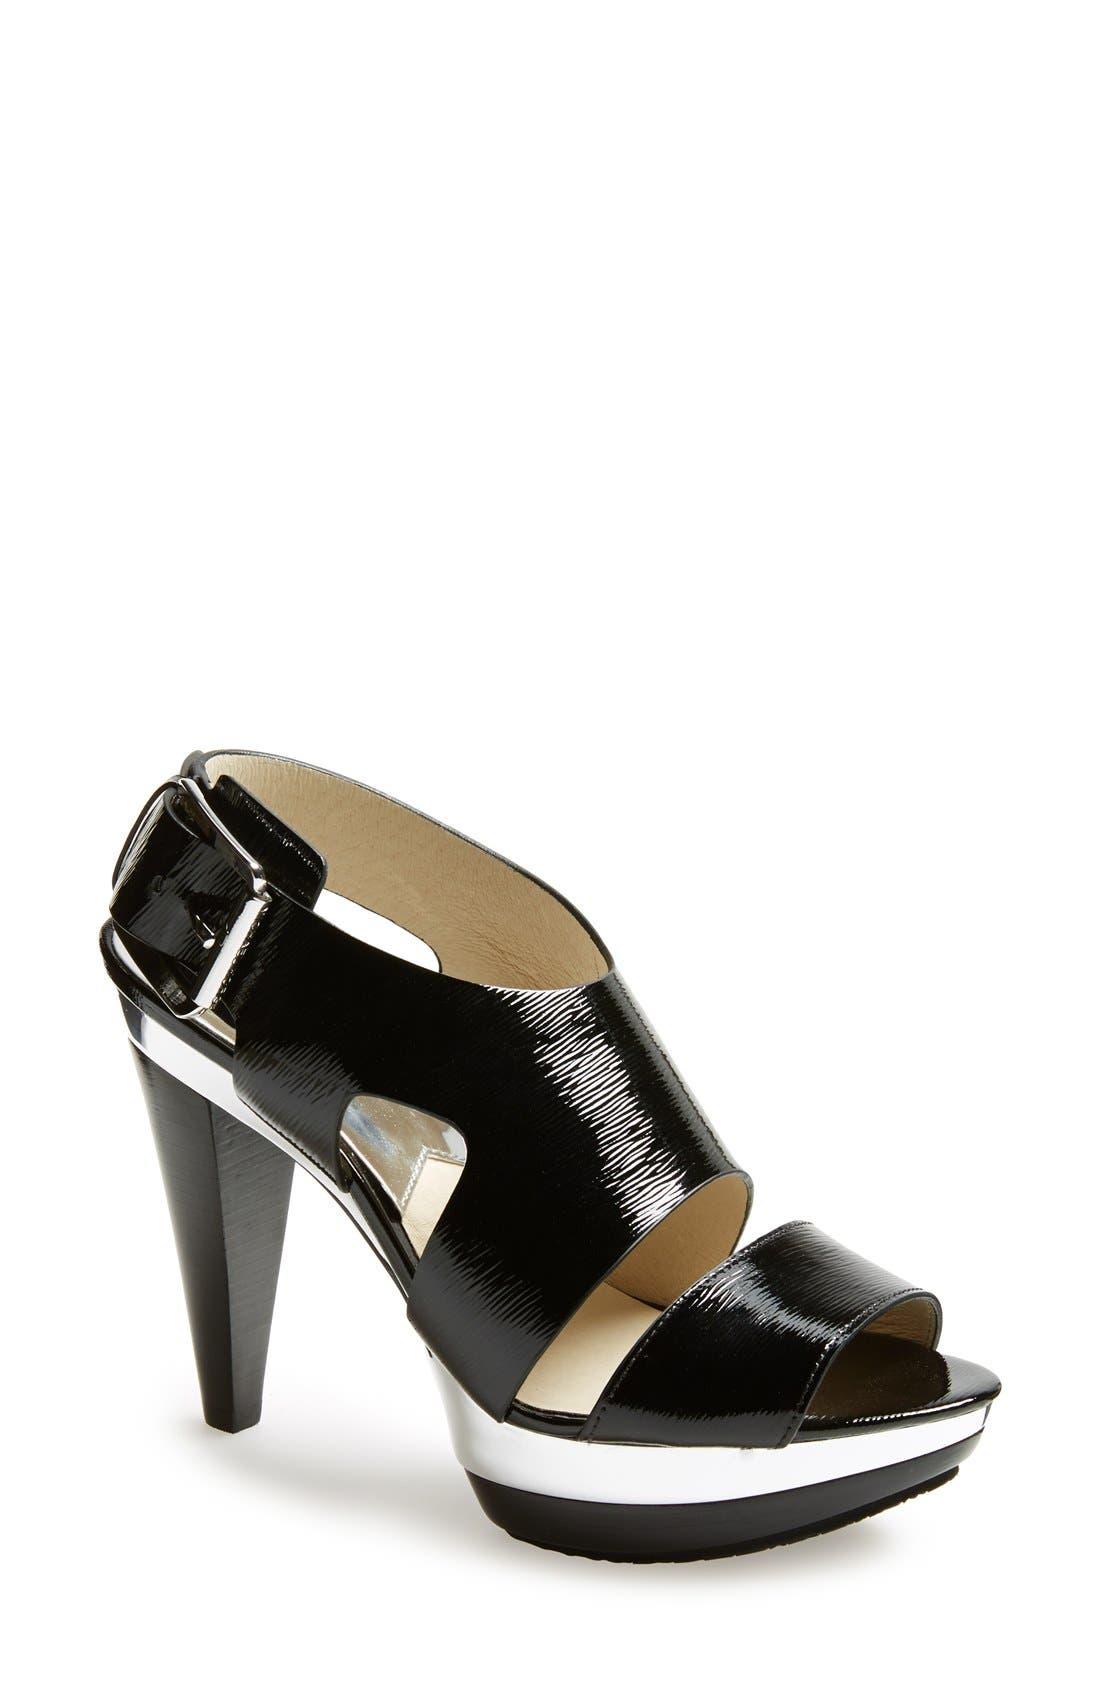 Main Image - MICHAEL Michael Kors 'Carla' Saffiano Patent Leather Sandal (Women)